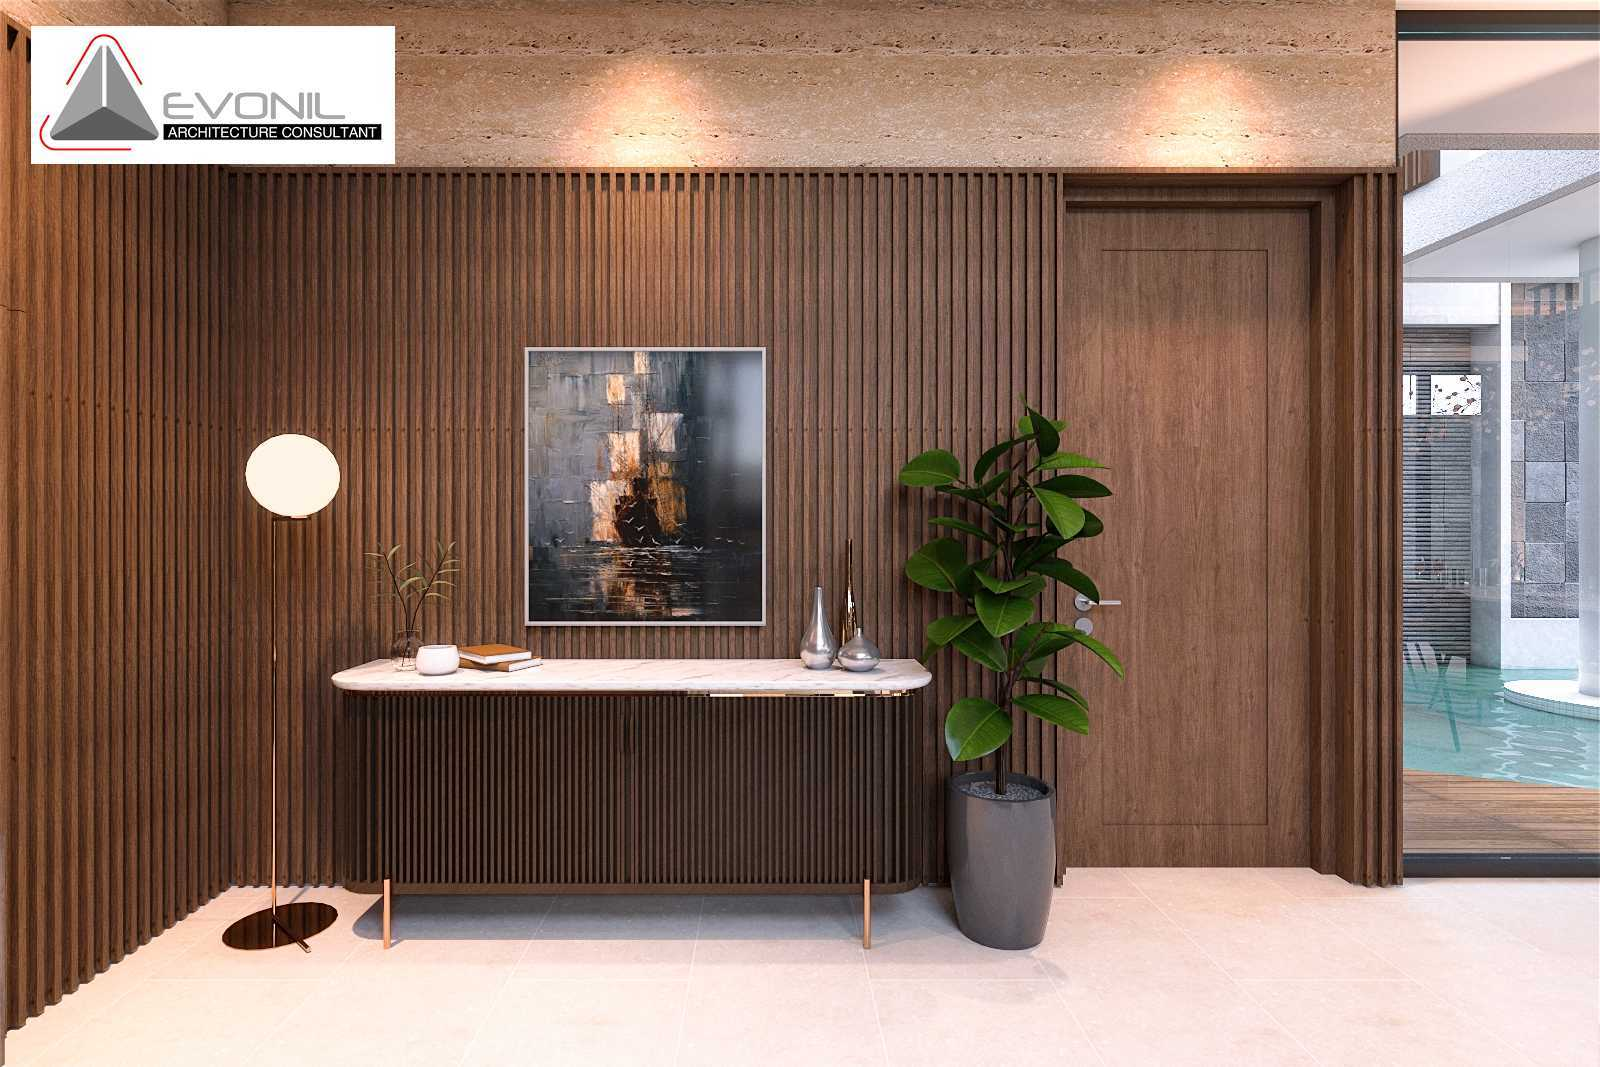 Evonil Architecture Residence Sunter Hijau Jakarta, Daerah Khusus Ibukota Jakarta, Indonesia Jakarta, Daerah Khusus Ibukota Jakarta, Indonesia Evonil-Architecture-Residence-Sunter-Hijau   84006